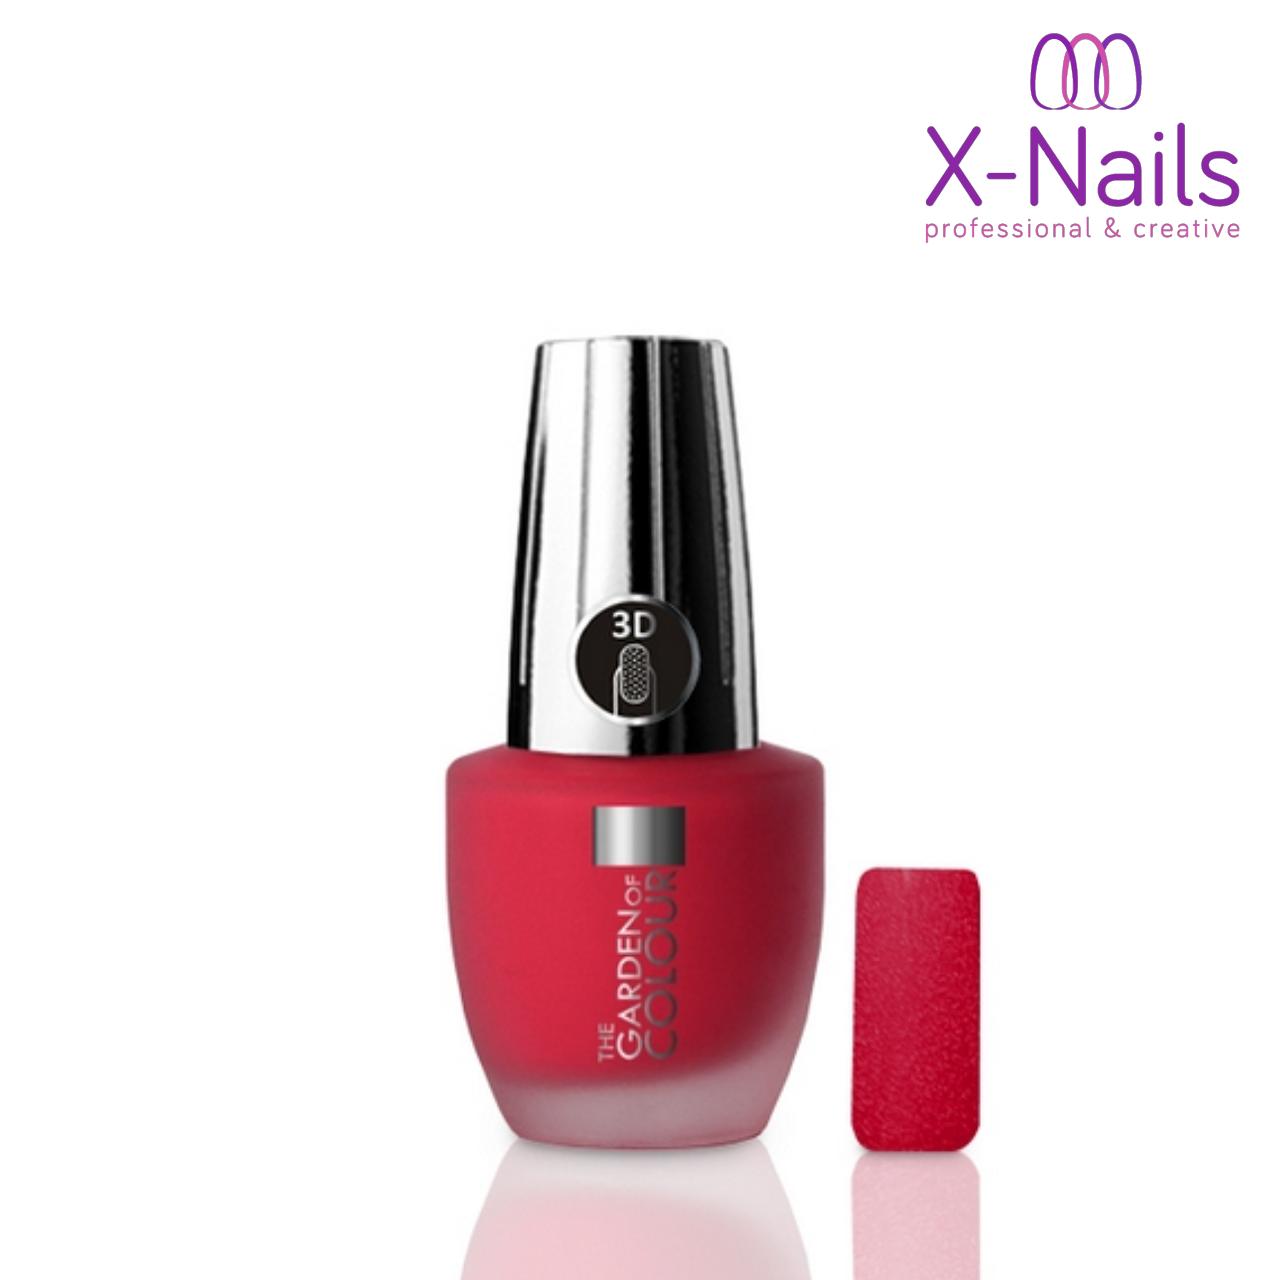 X Nails Lak Na Nehty 15 Ml 3d Piskovy Efekt 116 Sandy In Red